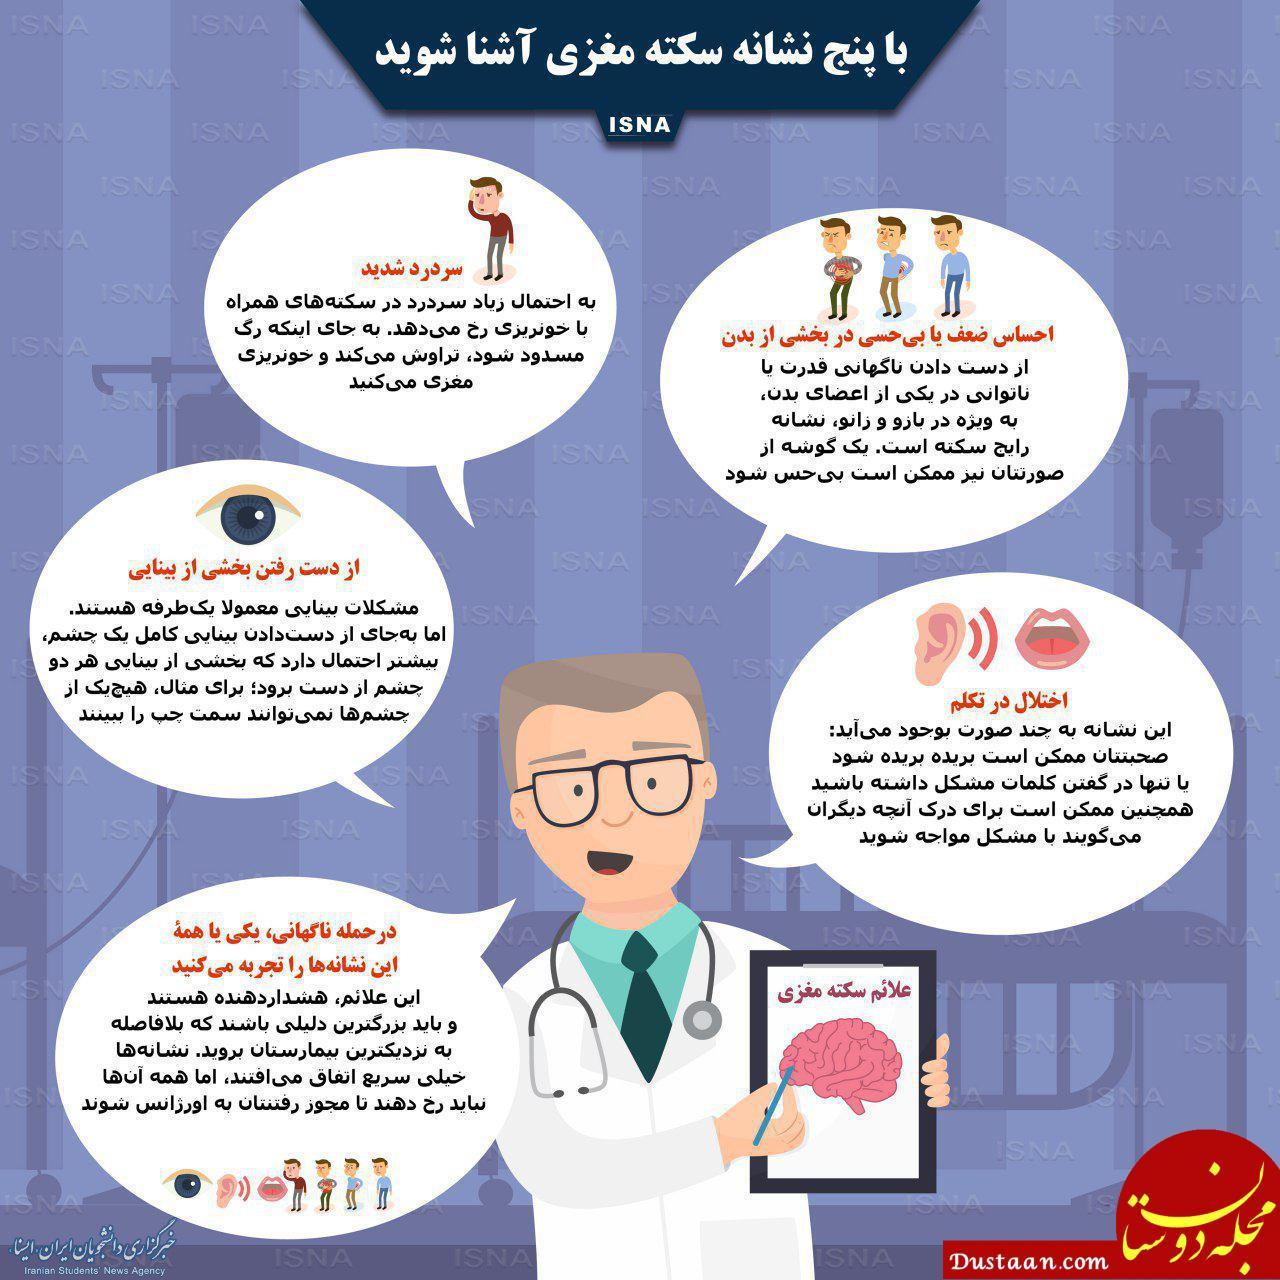 www.dustaan.com با پنج نشانه سکته مغزی آشنا شوید